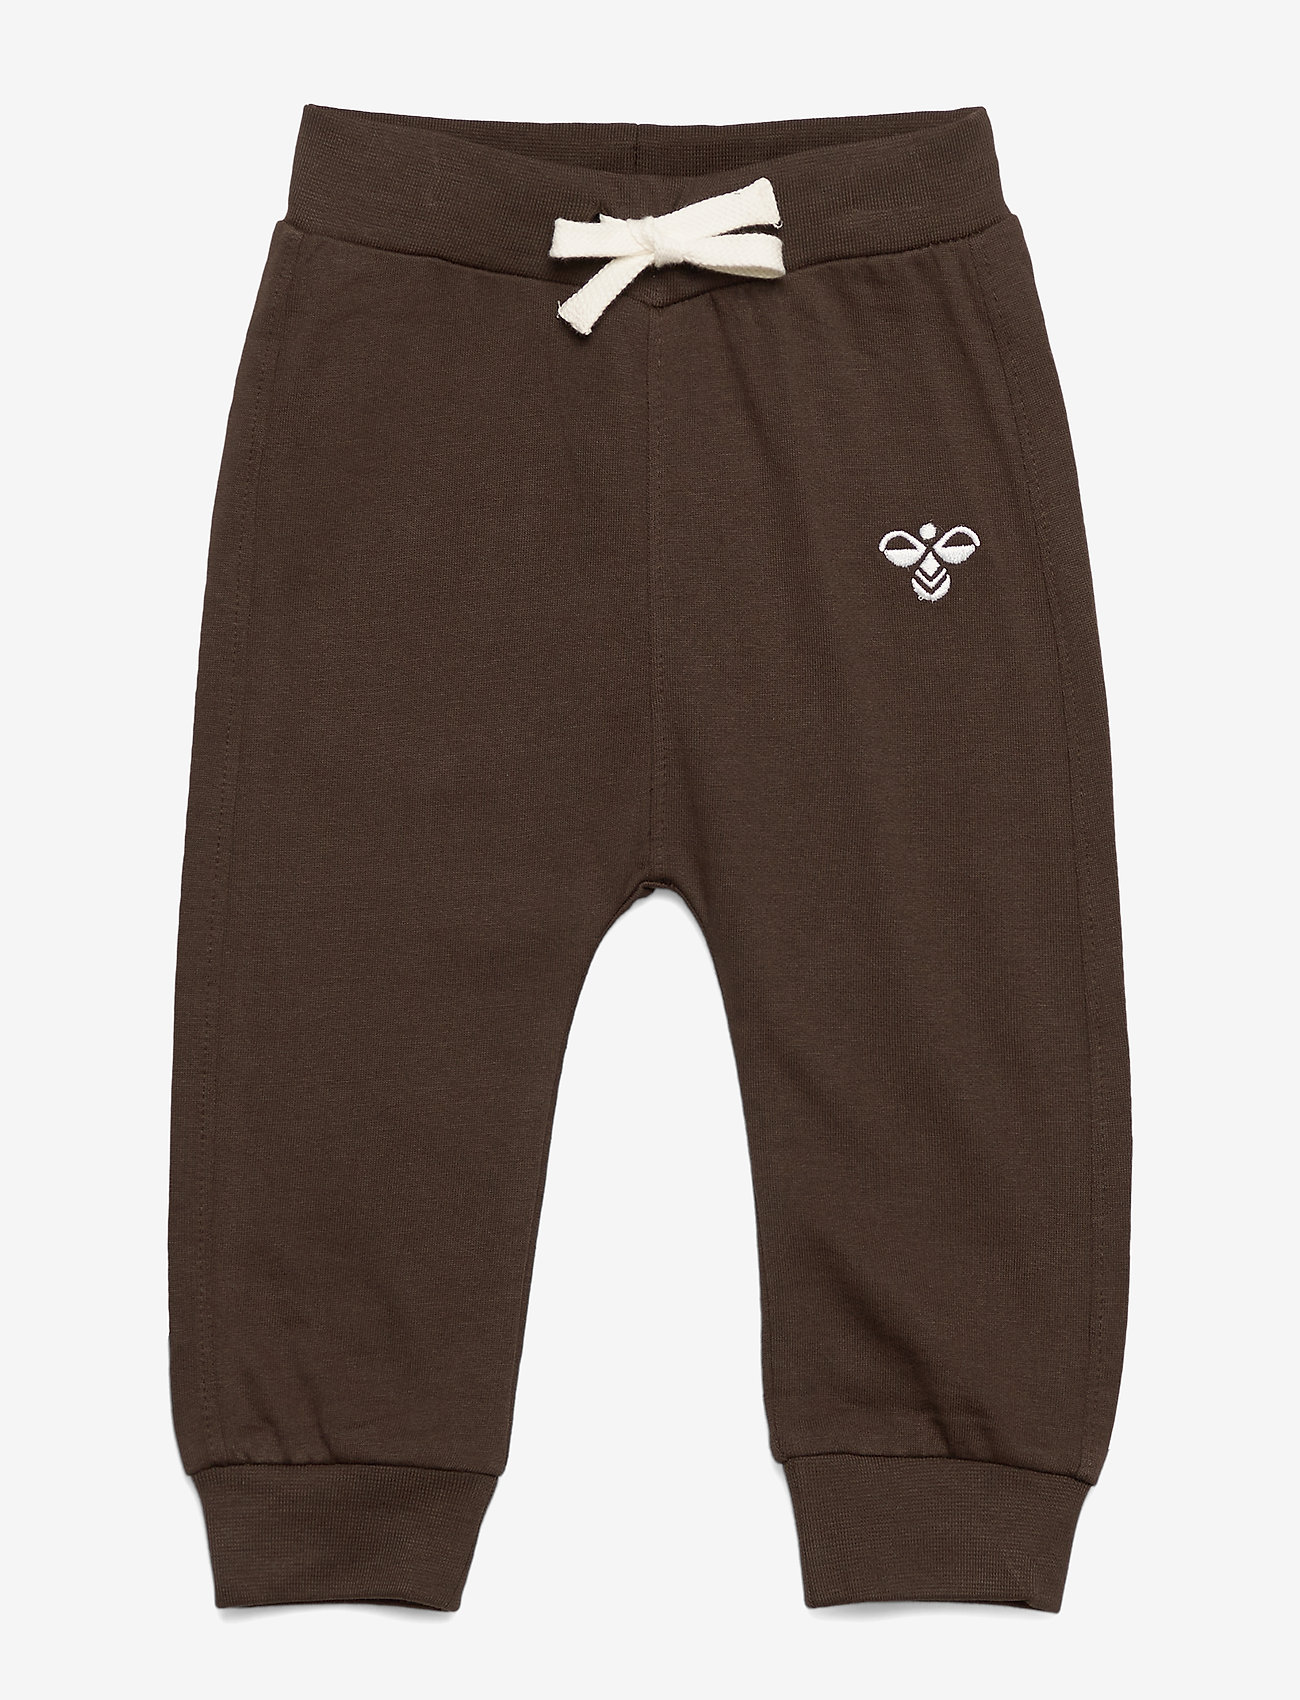 Hummel - hmlJUNO PANTS - sweatpants - java - 0